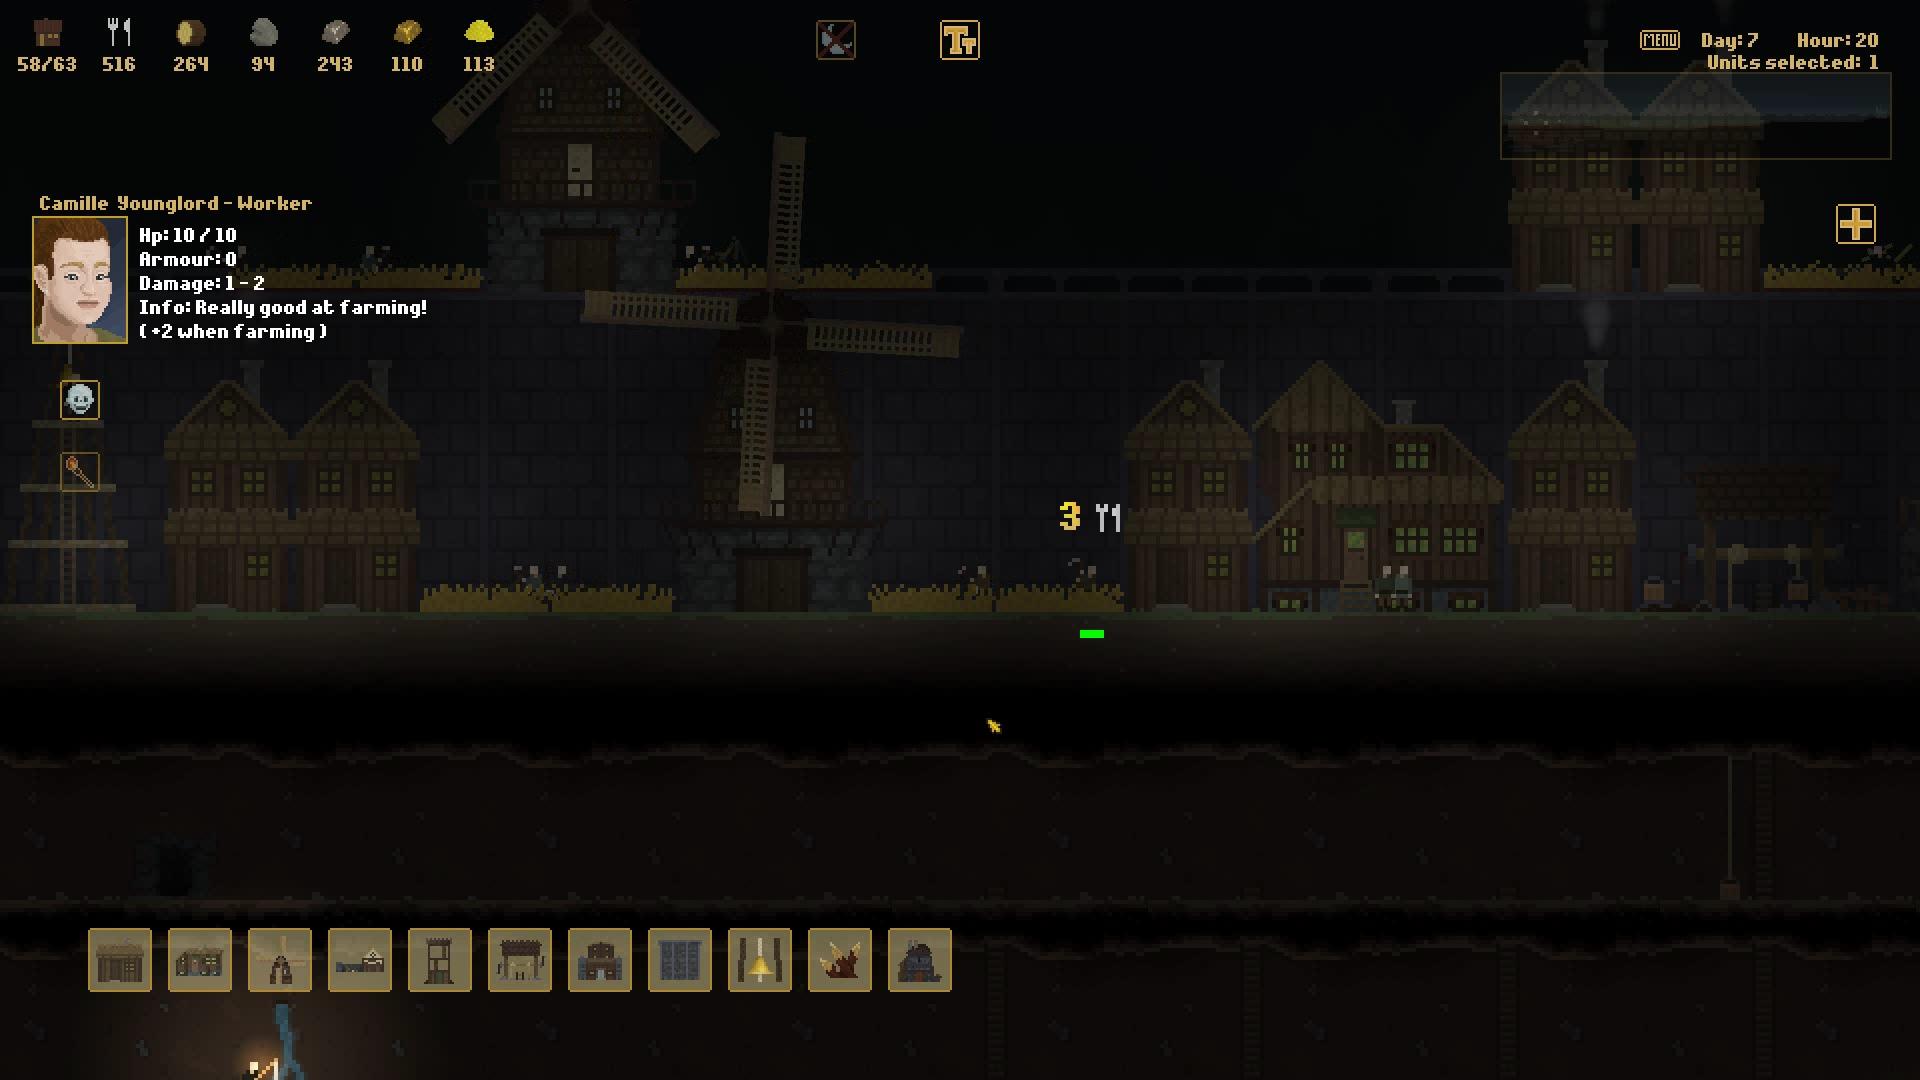 冷峻的夜/Grim Nights(v1.3.3.1)插图2